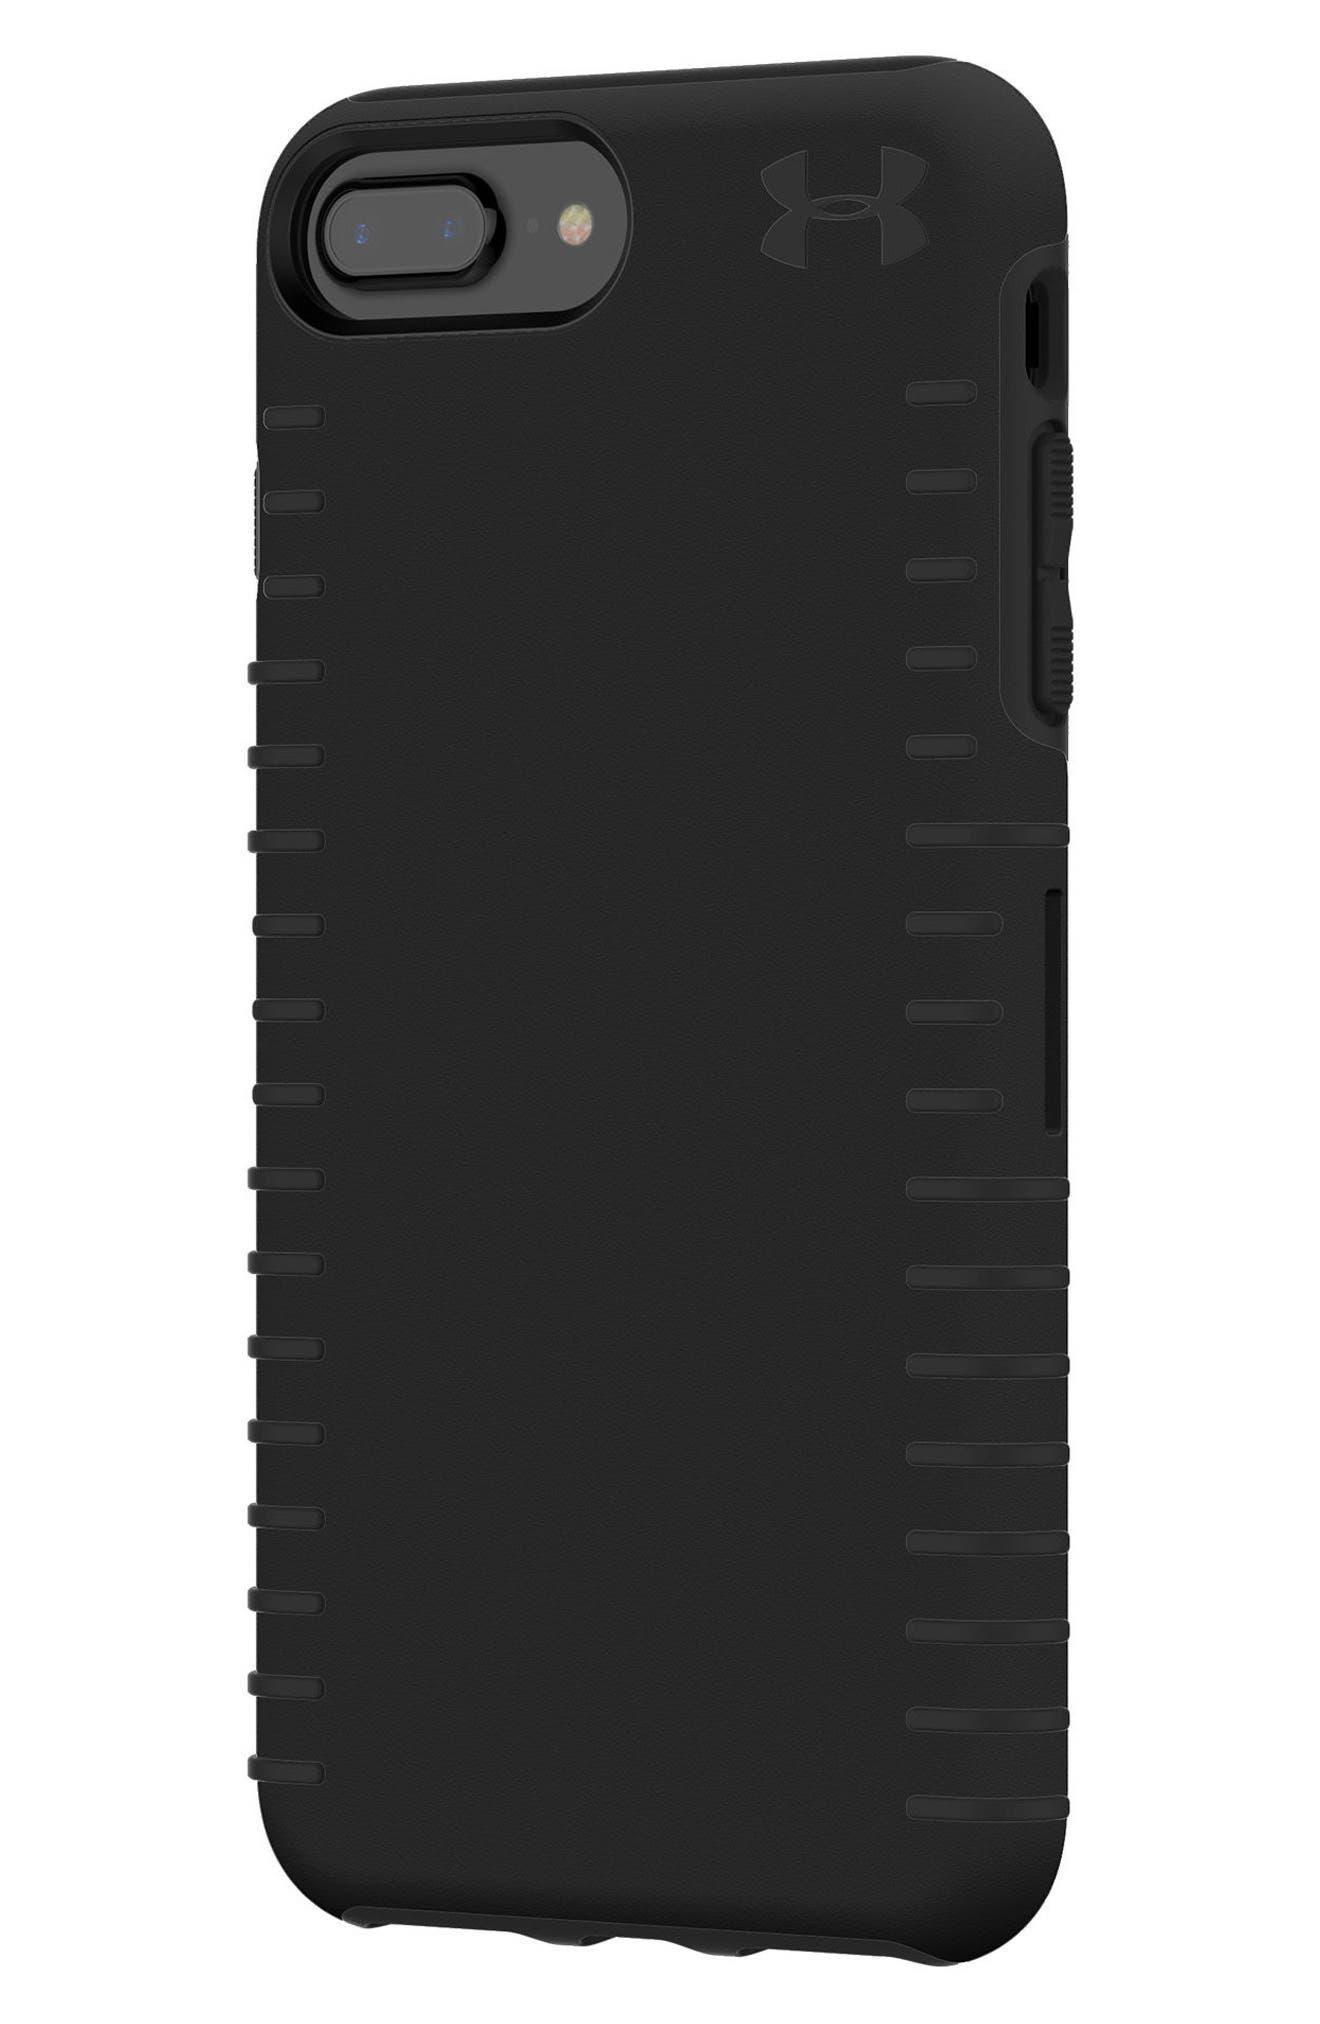 Protect Grip iPhone 6/6s/7/8 Plus Case,                             Alternate thumbnail 3, color,                             001